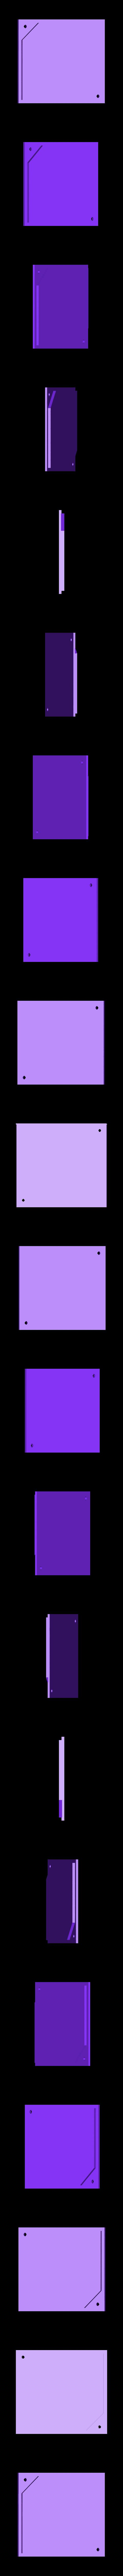 pi-case-window.stl Download free STL file CNC Wood Case for Raspberry Pi 3 • 3D print template, Adafruit